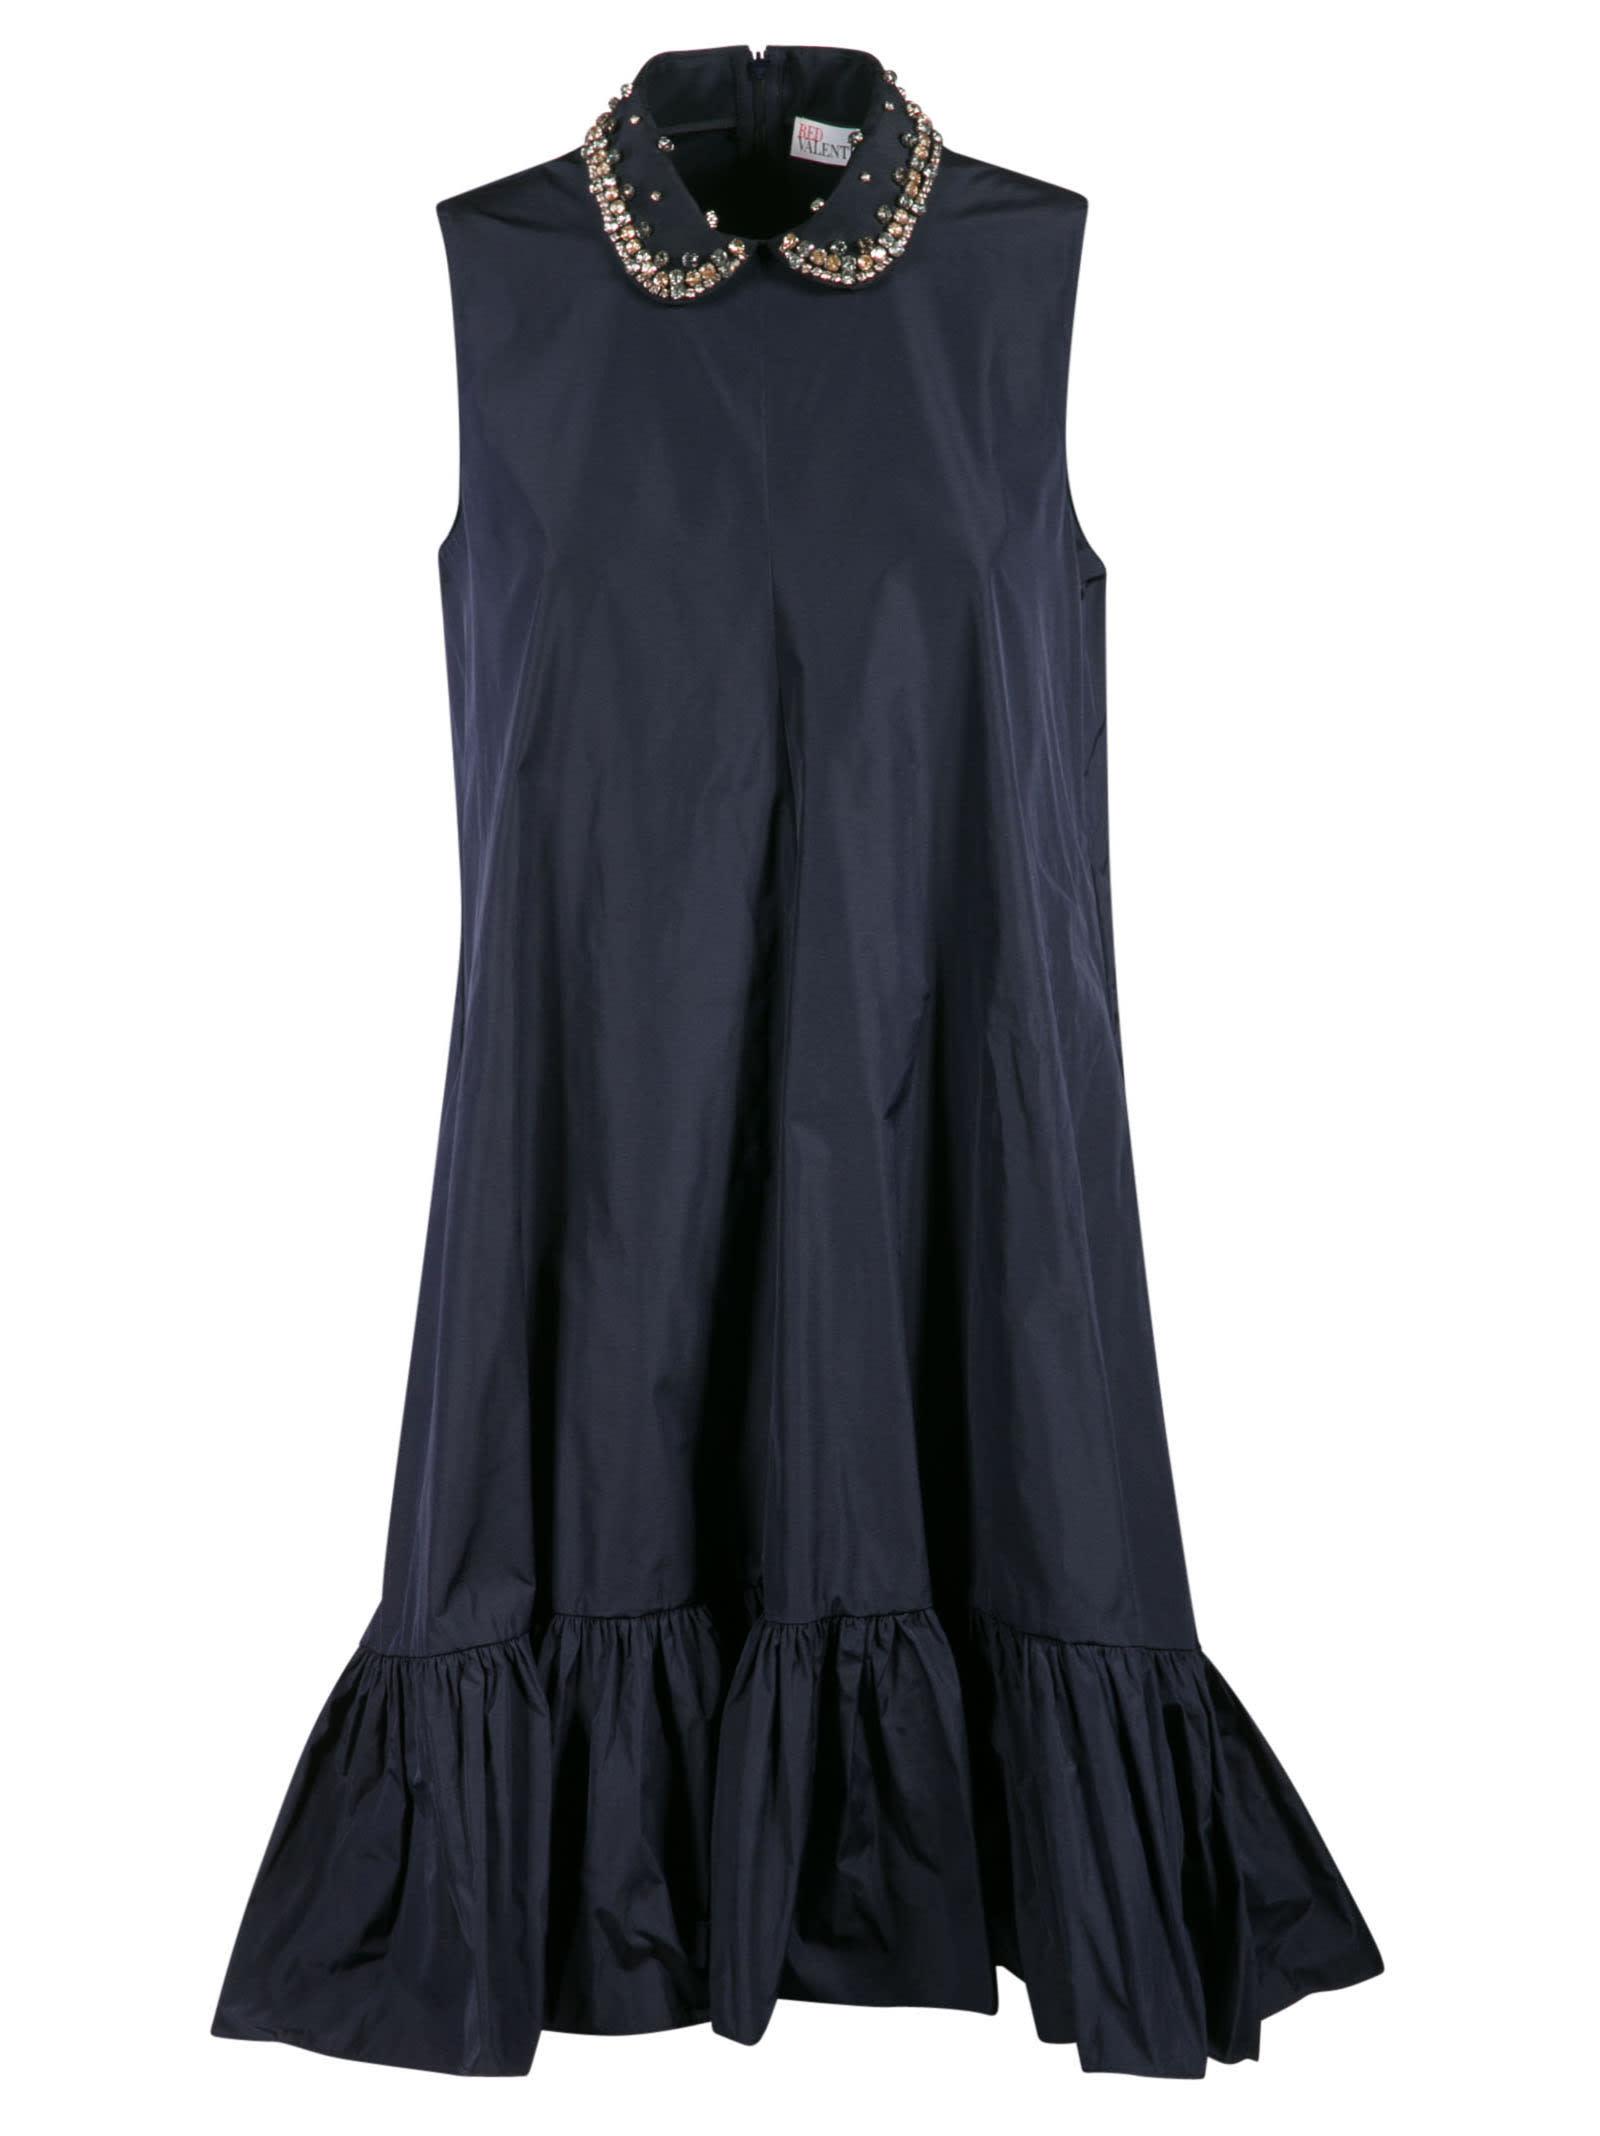 RED Valentino Embellished Collar Sleeveless Dress